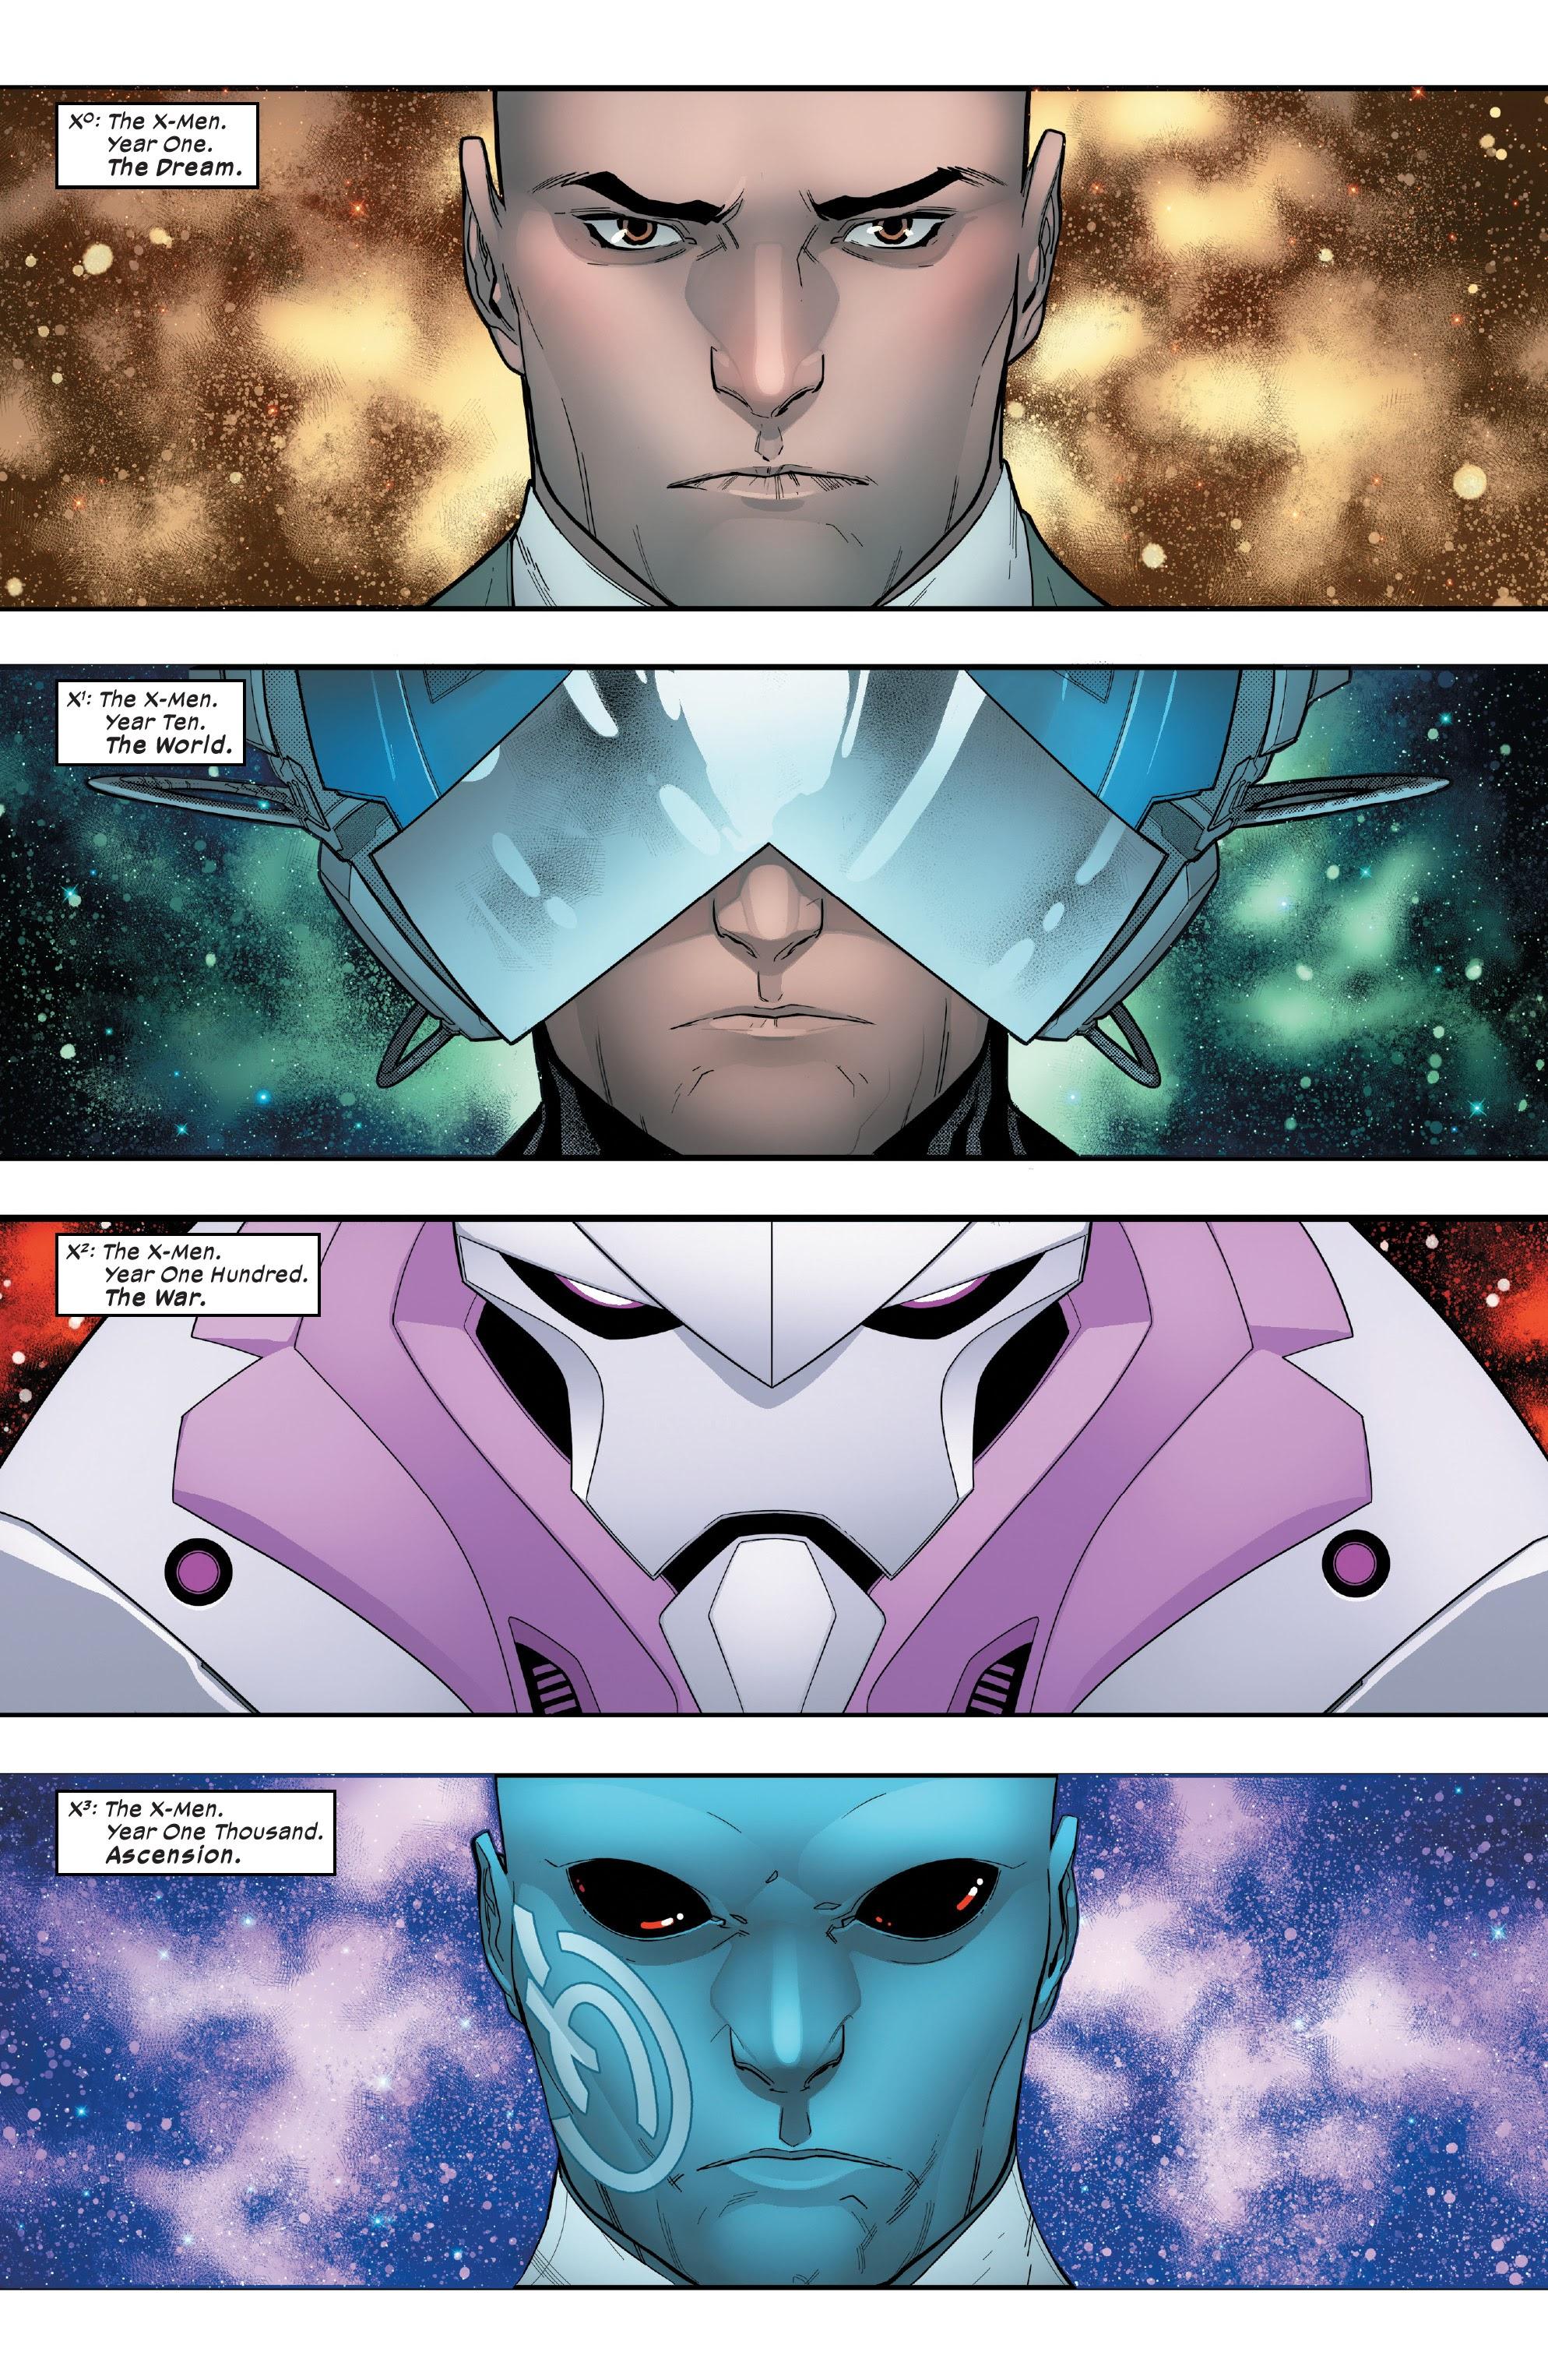 《X權力》連載規劃出漫威宇宙中變種人族群 1000 年下來的發展~